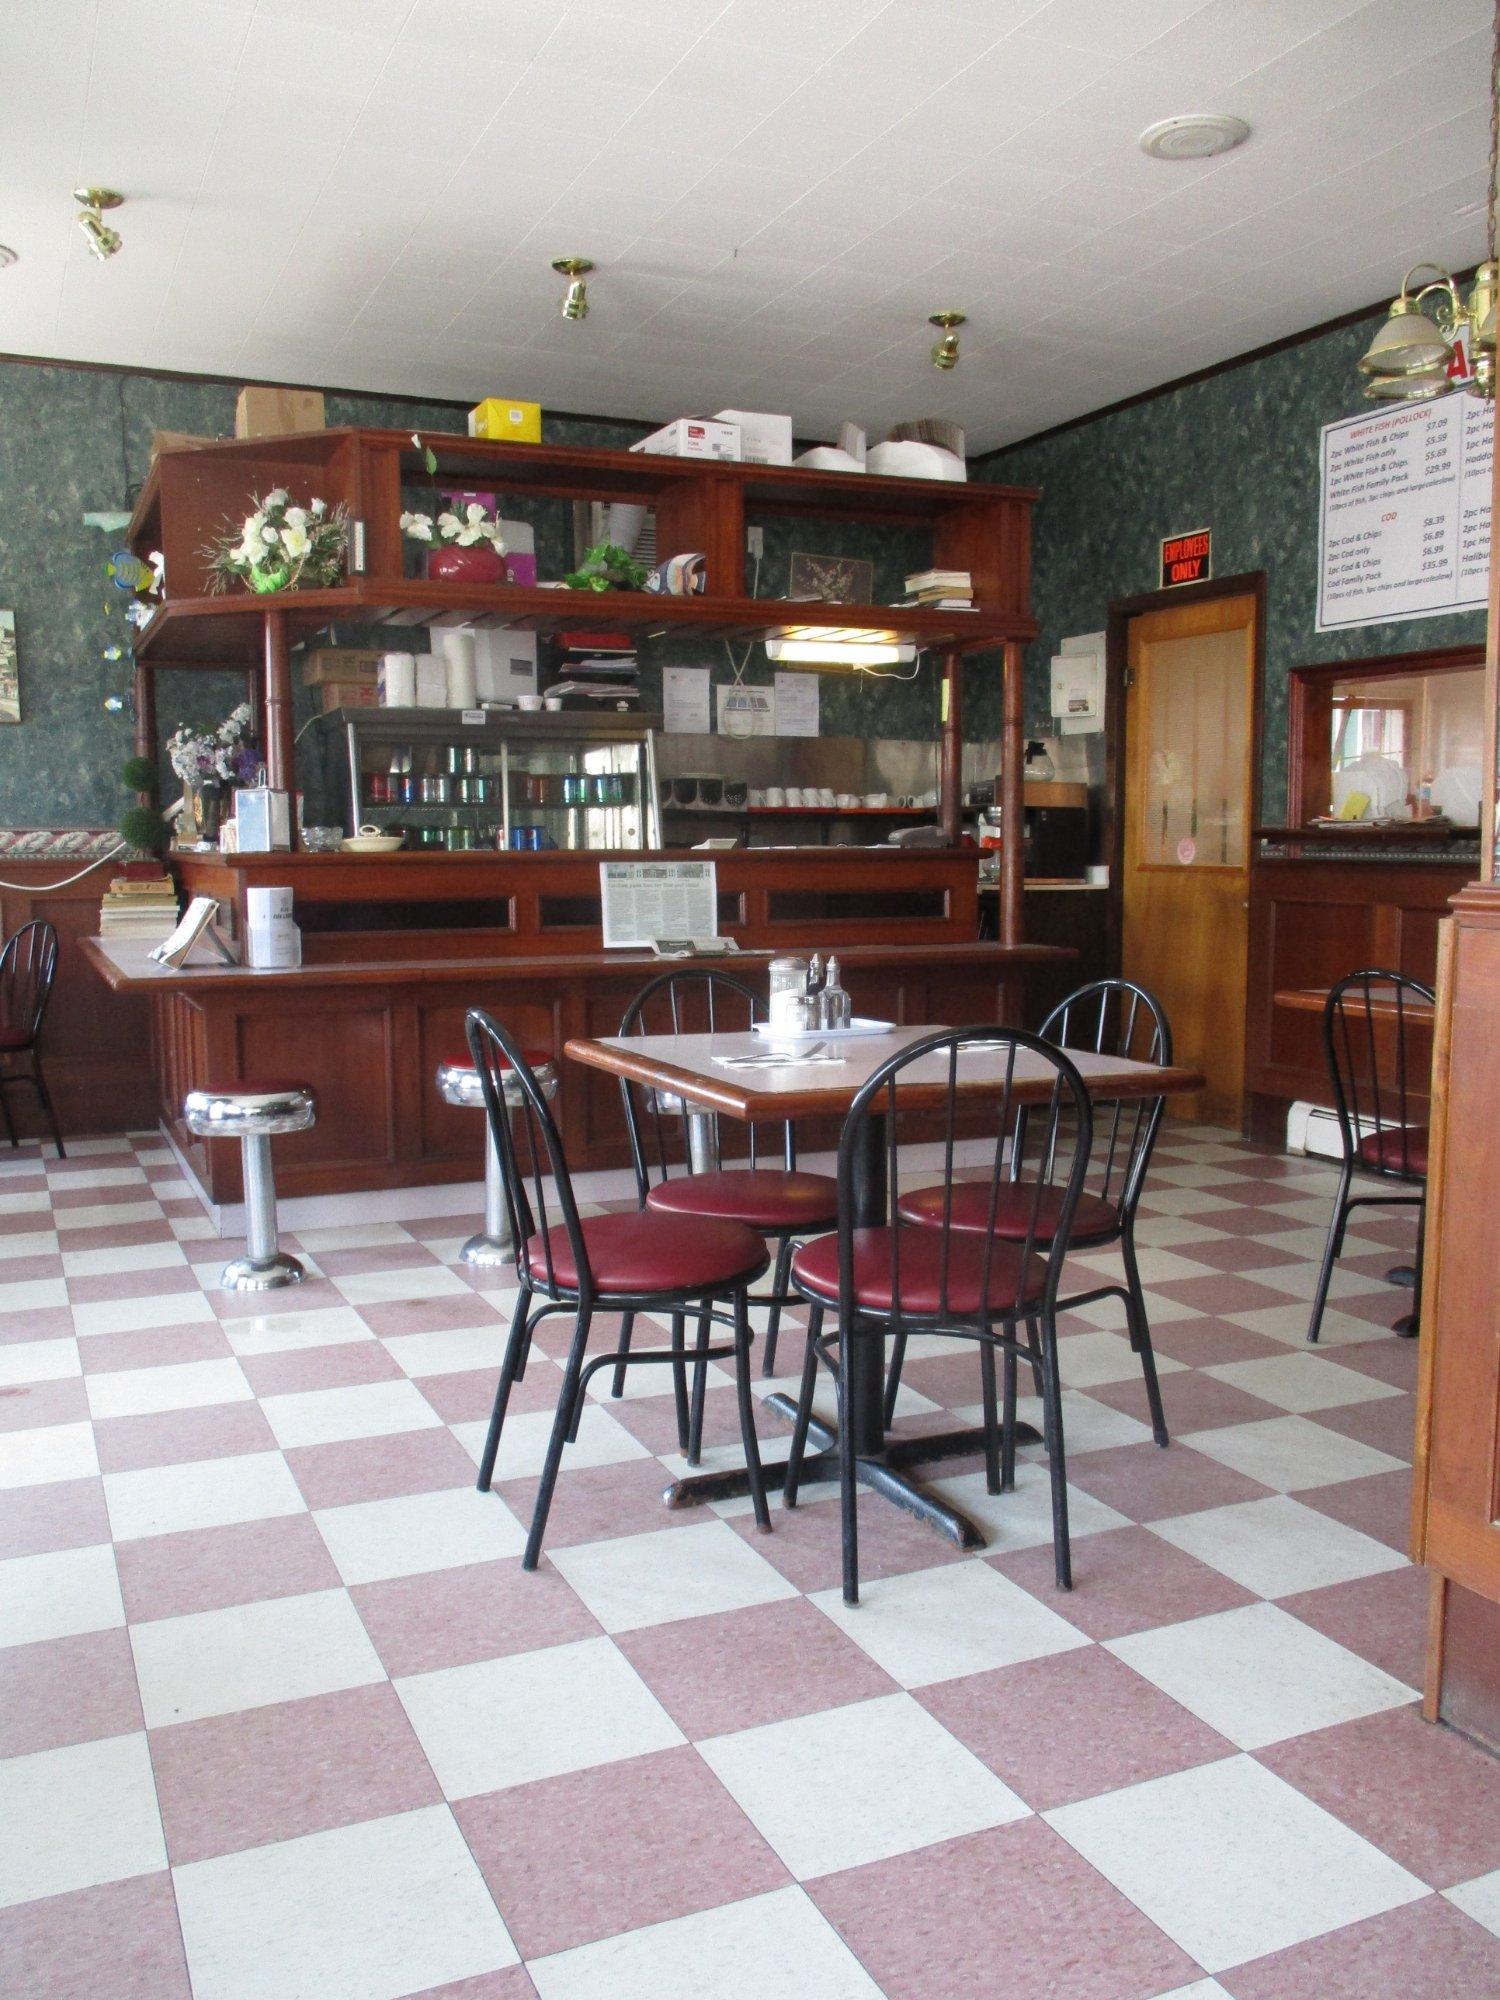 king fish chips kitchener restaurant reviews phone number king fish chips kitchener restaurant reviews phone number photos tripadvisor